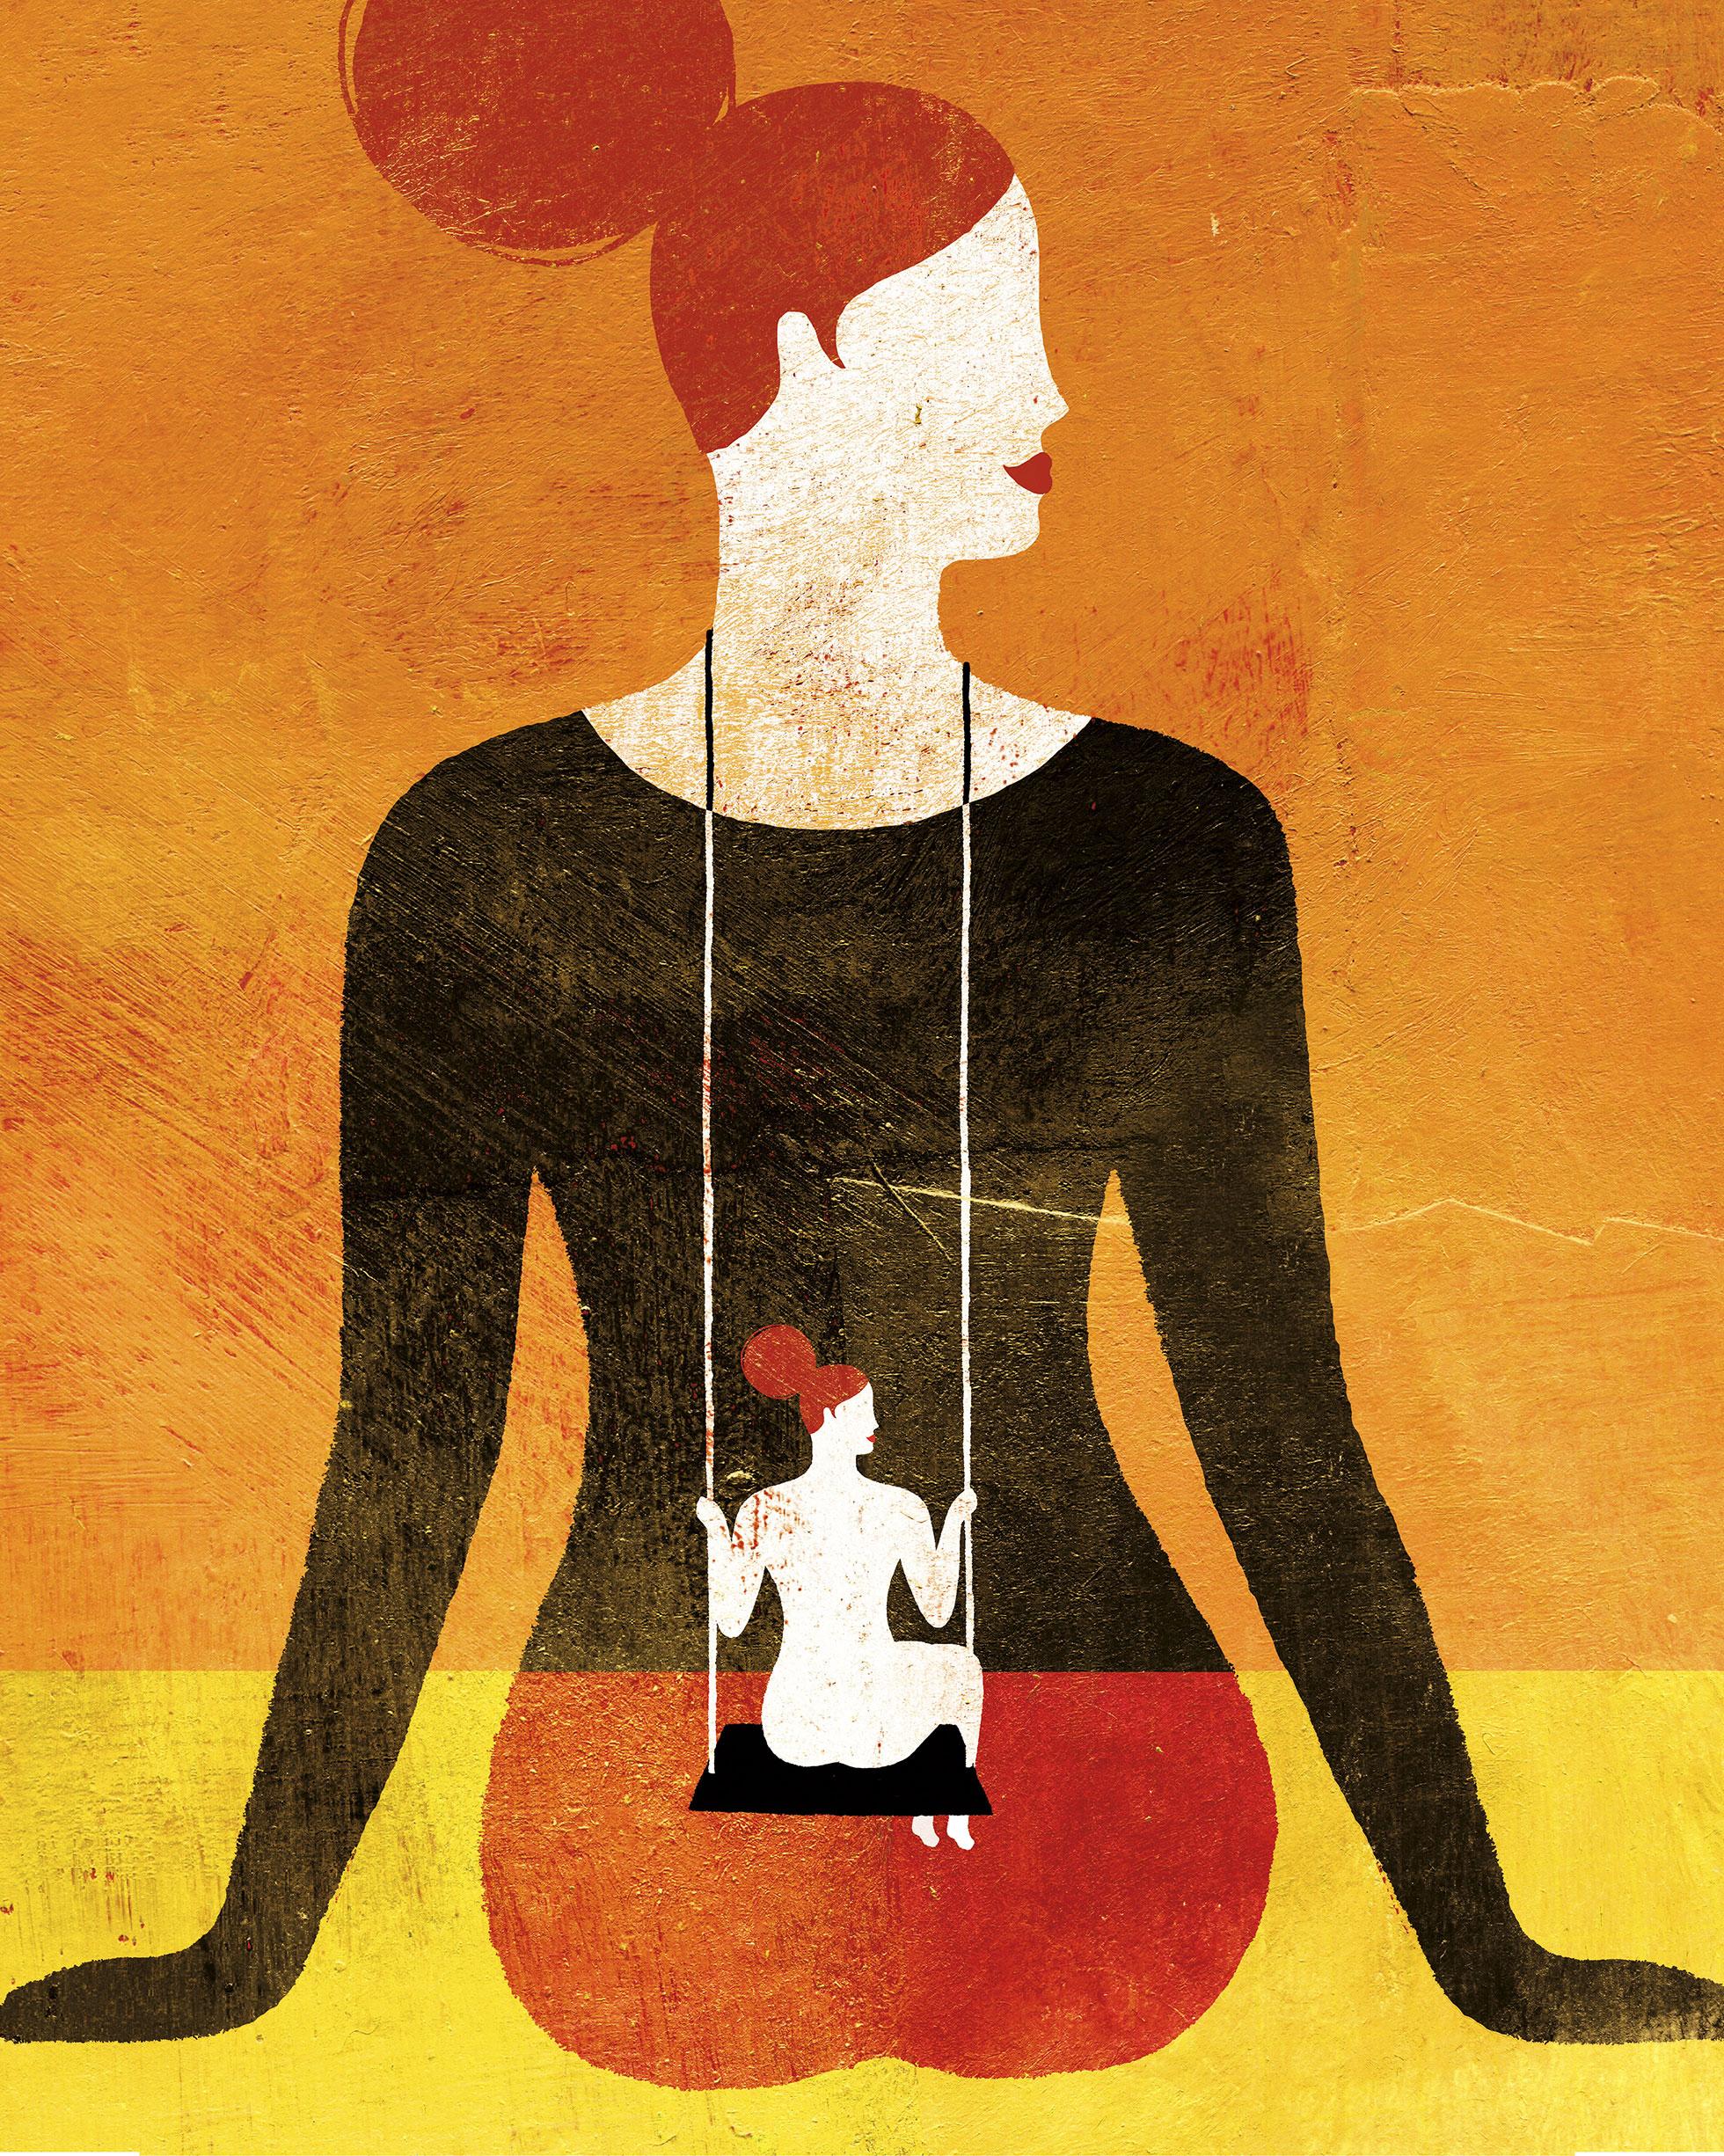 woman-incertitude-feelings-1-personalproject